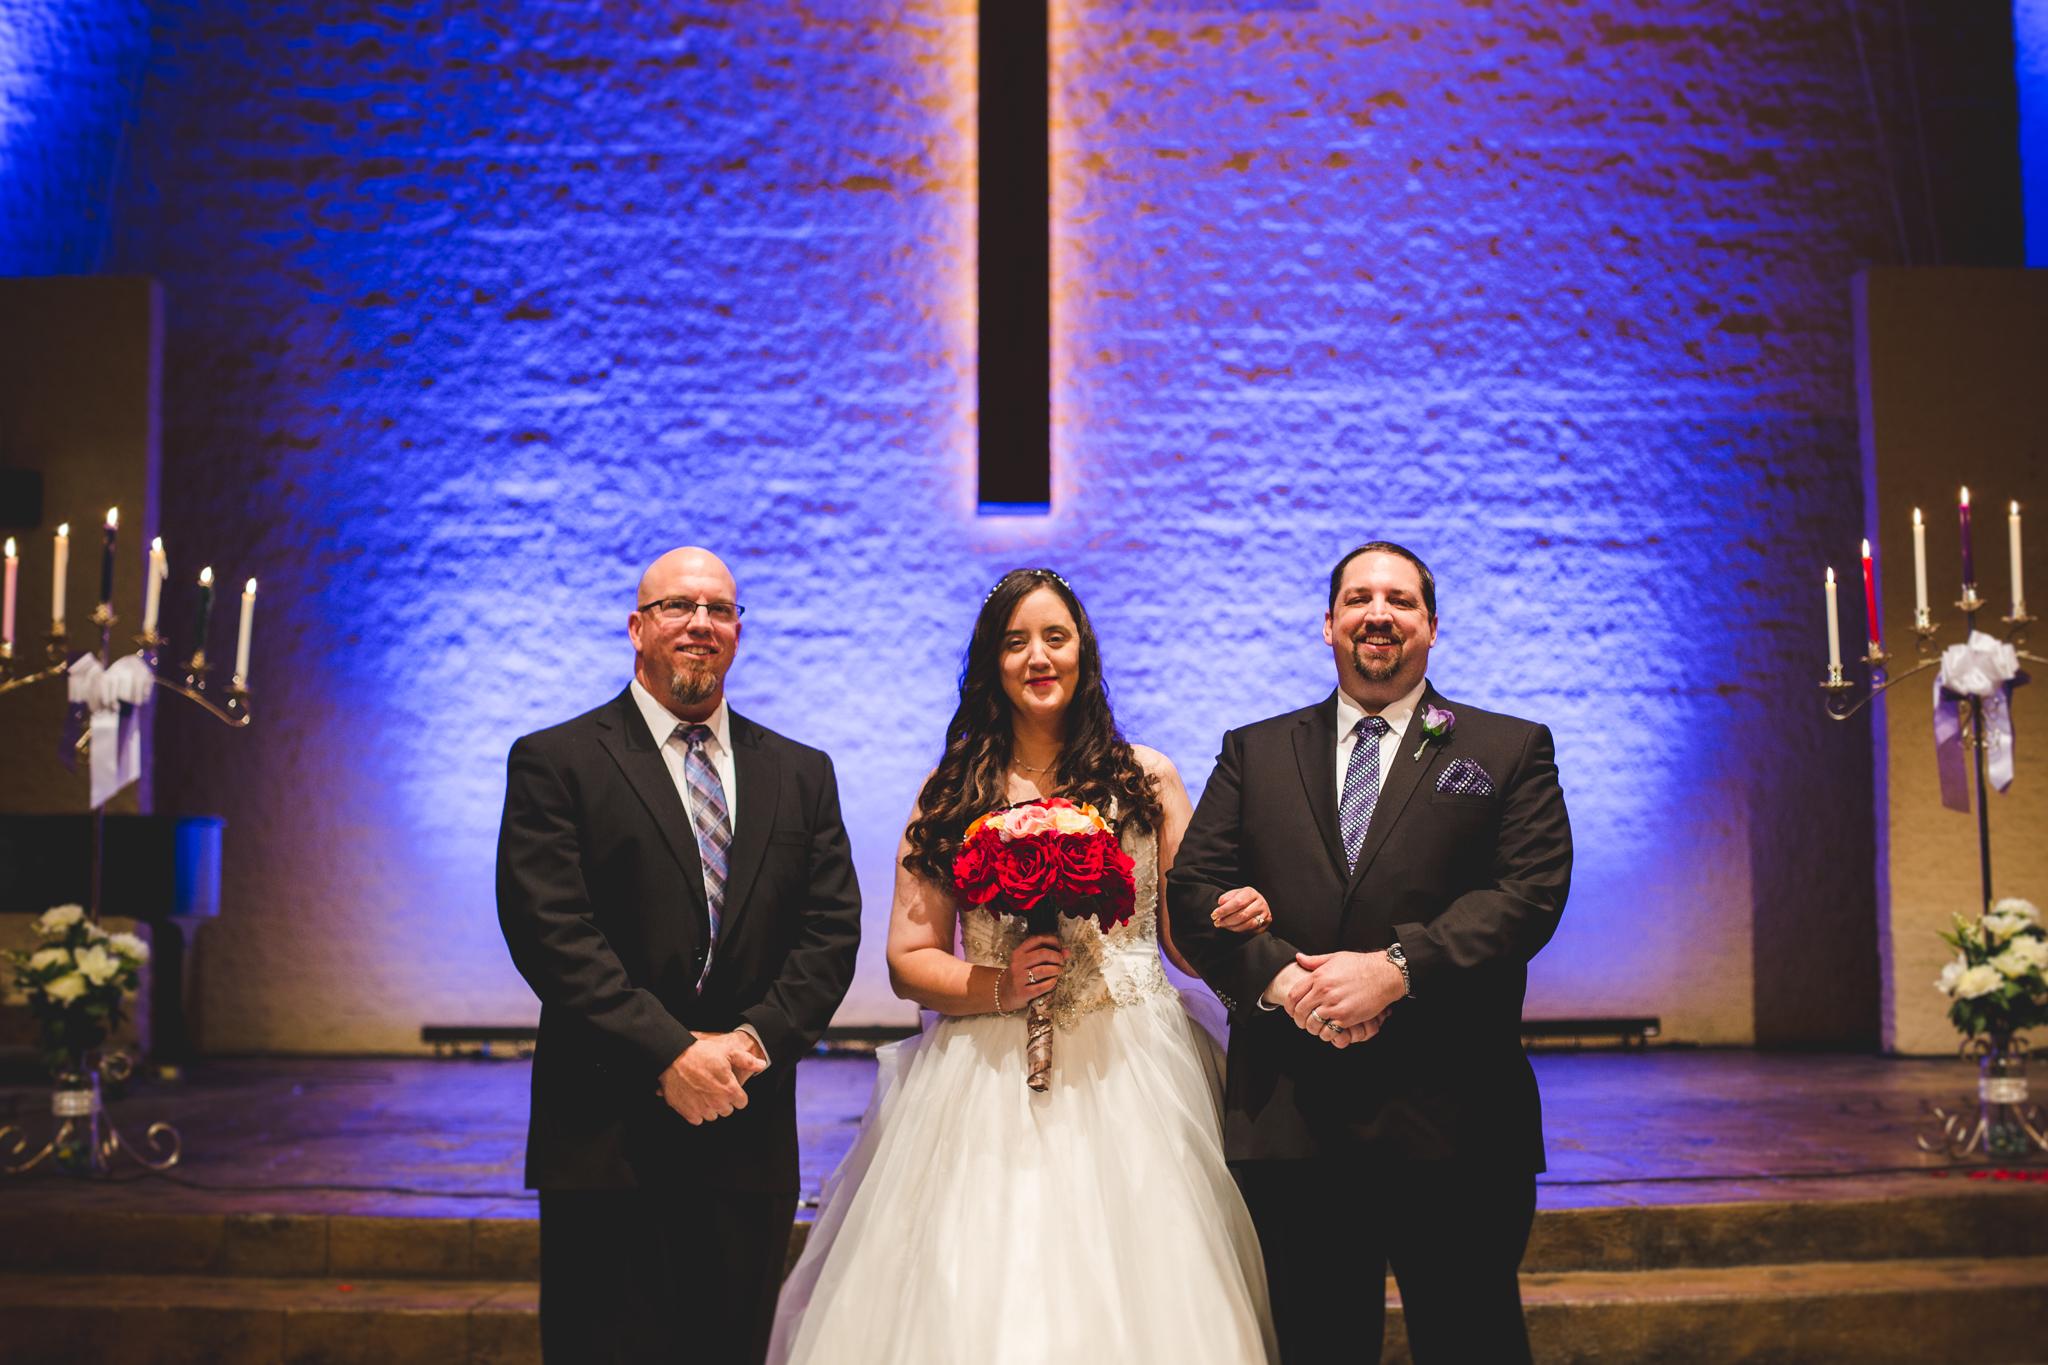 rs wedding family group shot 1